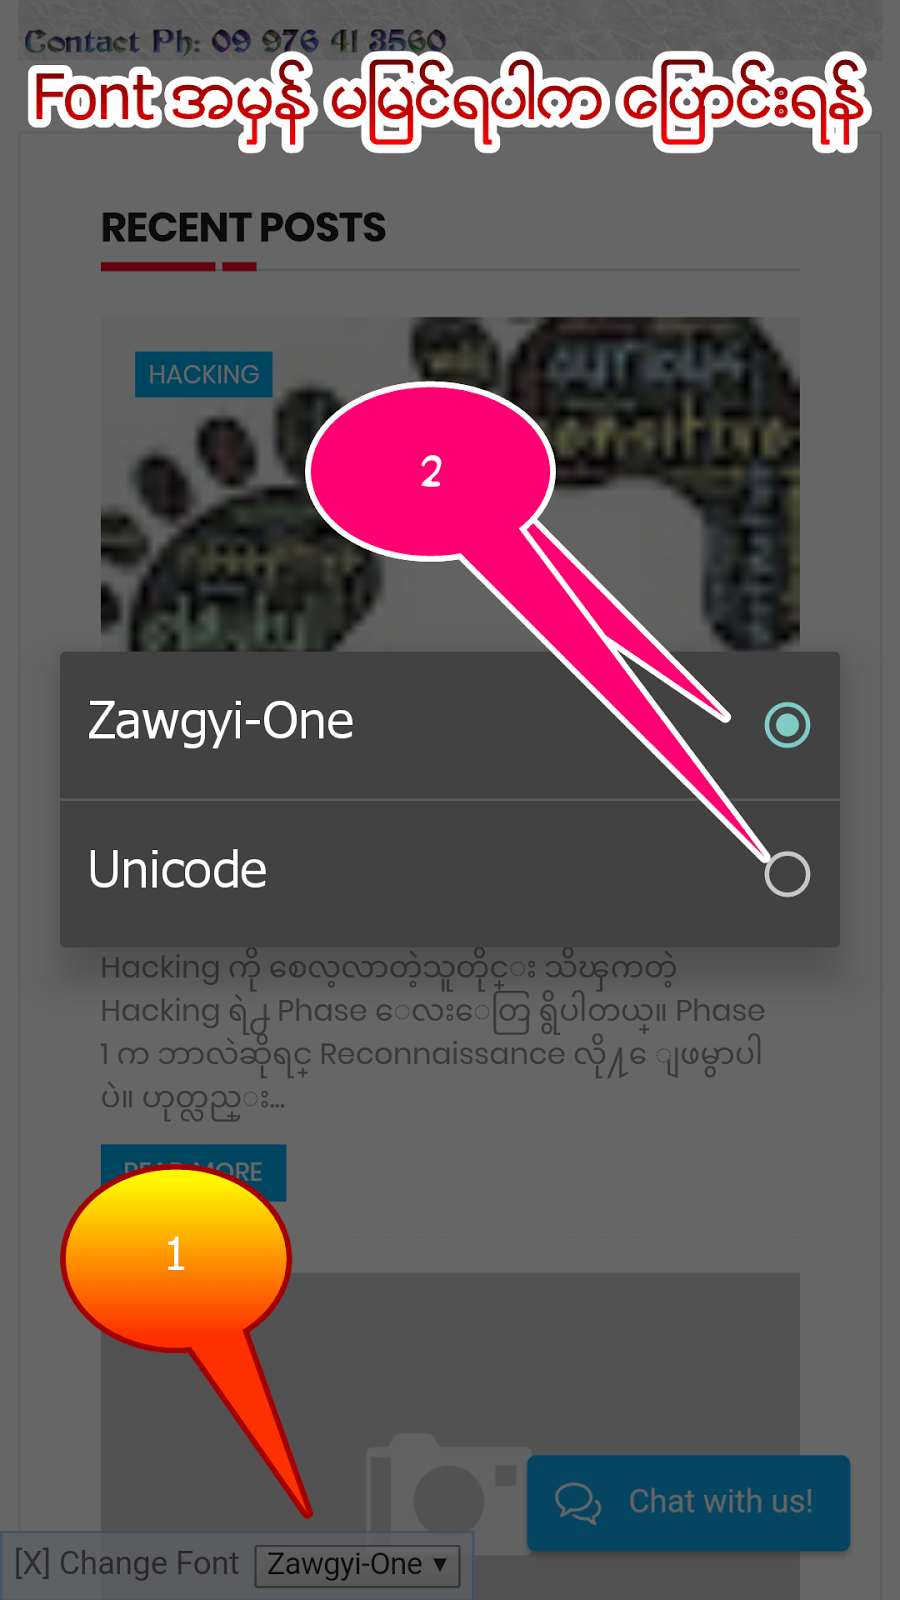 Android မှာ Metasploit တင်ပြီး Hacking လေ့လာရ